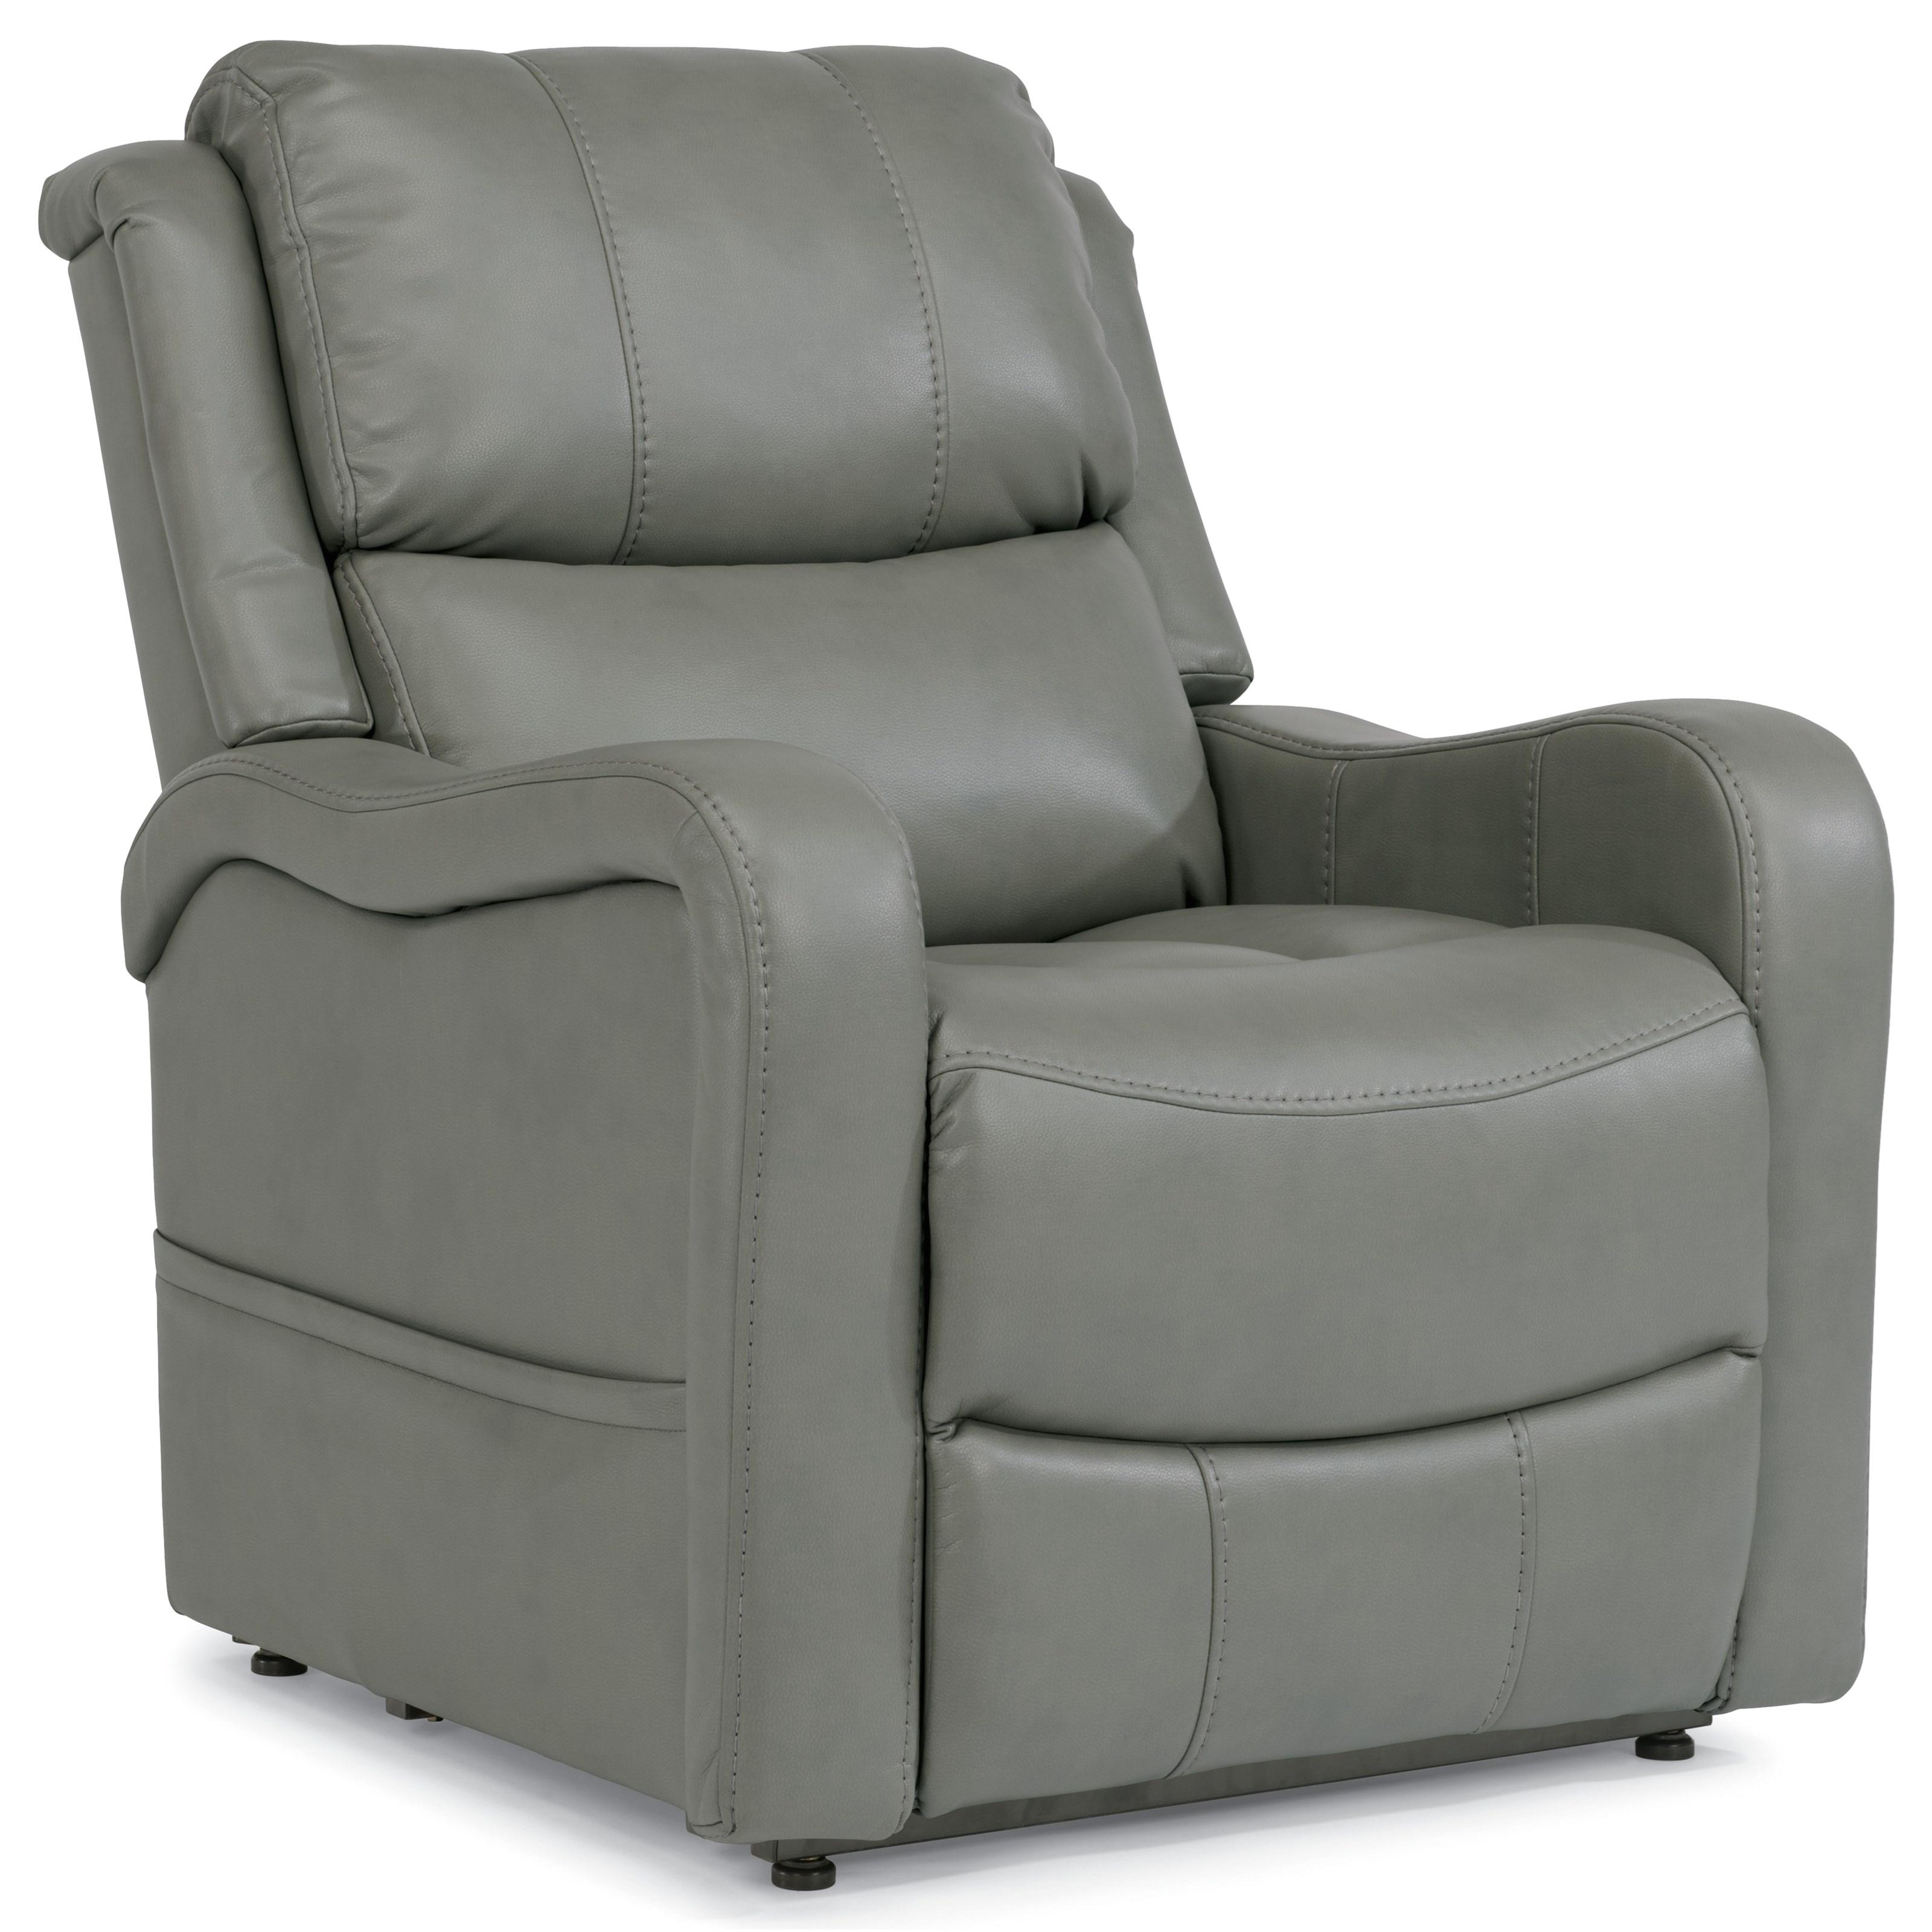 Walgreens Lift Chair Recliner Recliner Lift Chairs torino2017 Com